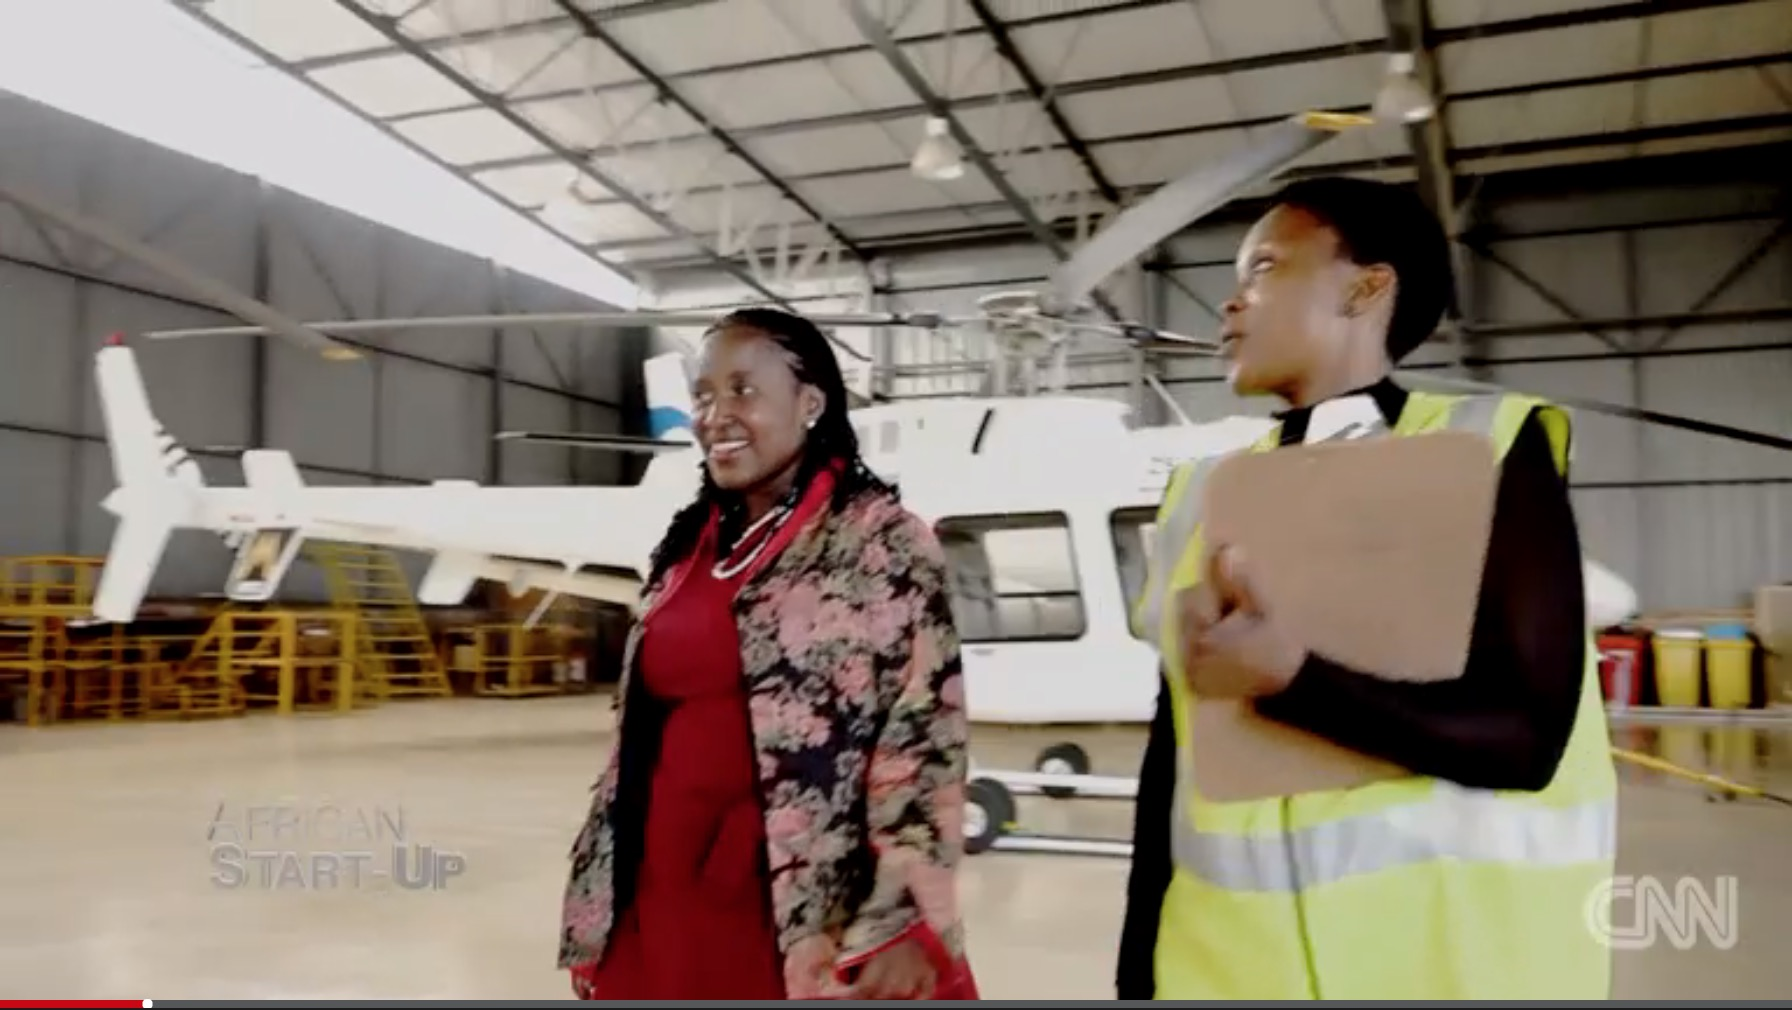 Source: CNN African Startup --- Watch Sibongile Sambo share her entrepreneurial journey